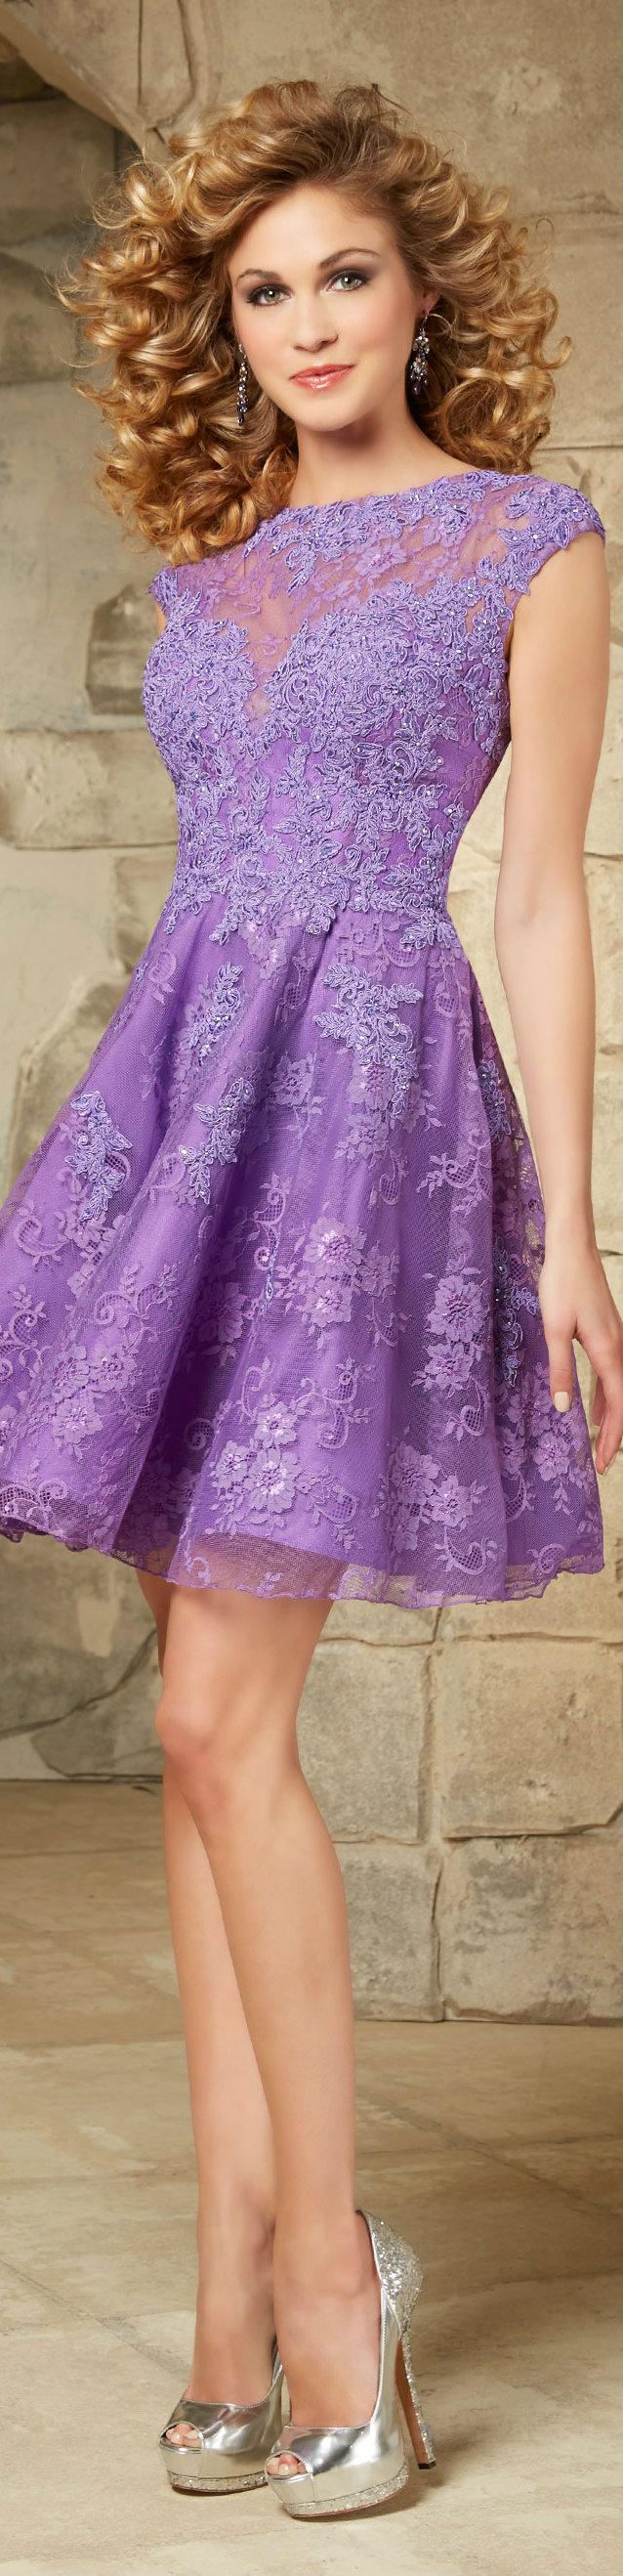 STICKS AND STONES ♥FCL | moda | Pinterest | Cocteles, Púrpura y ...